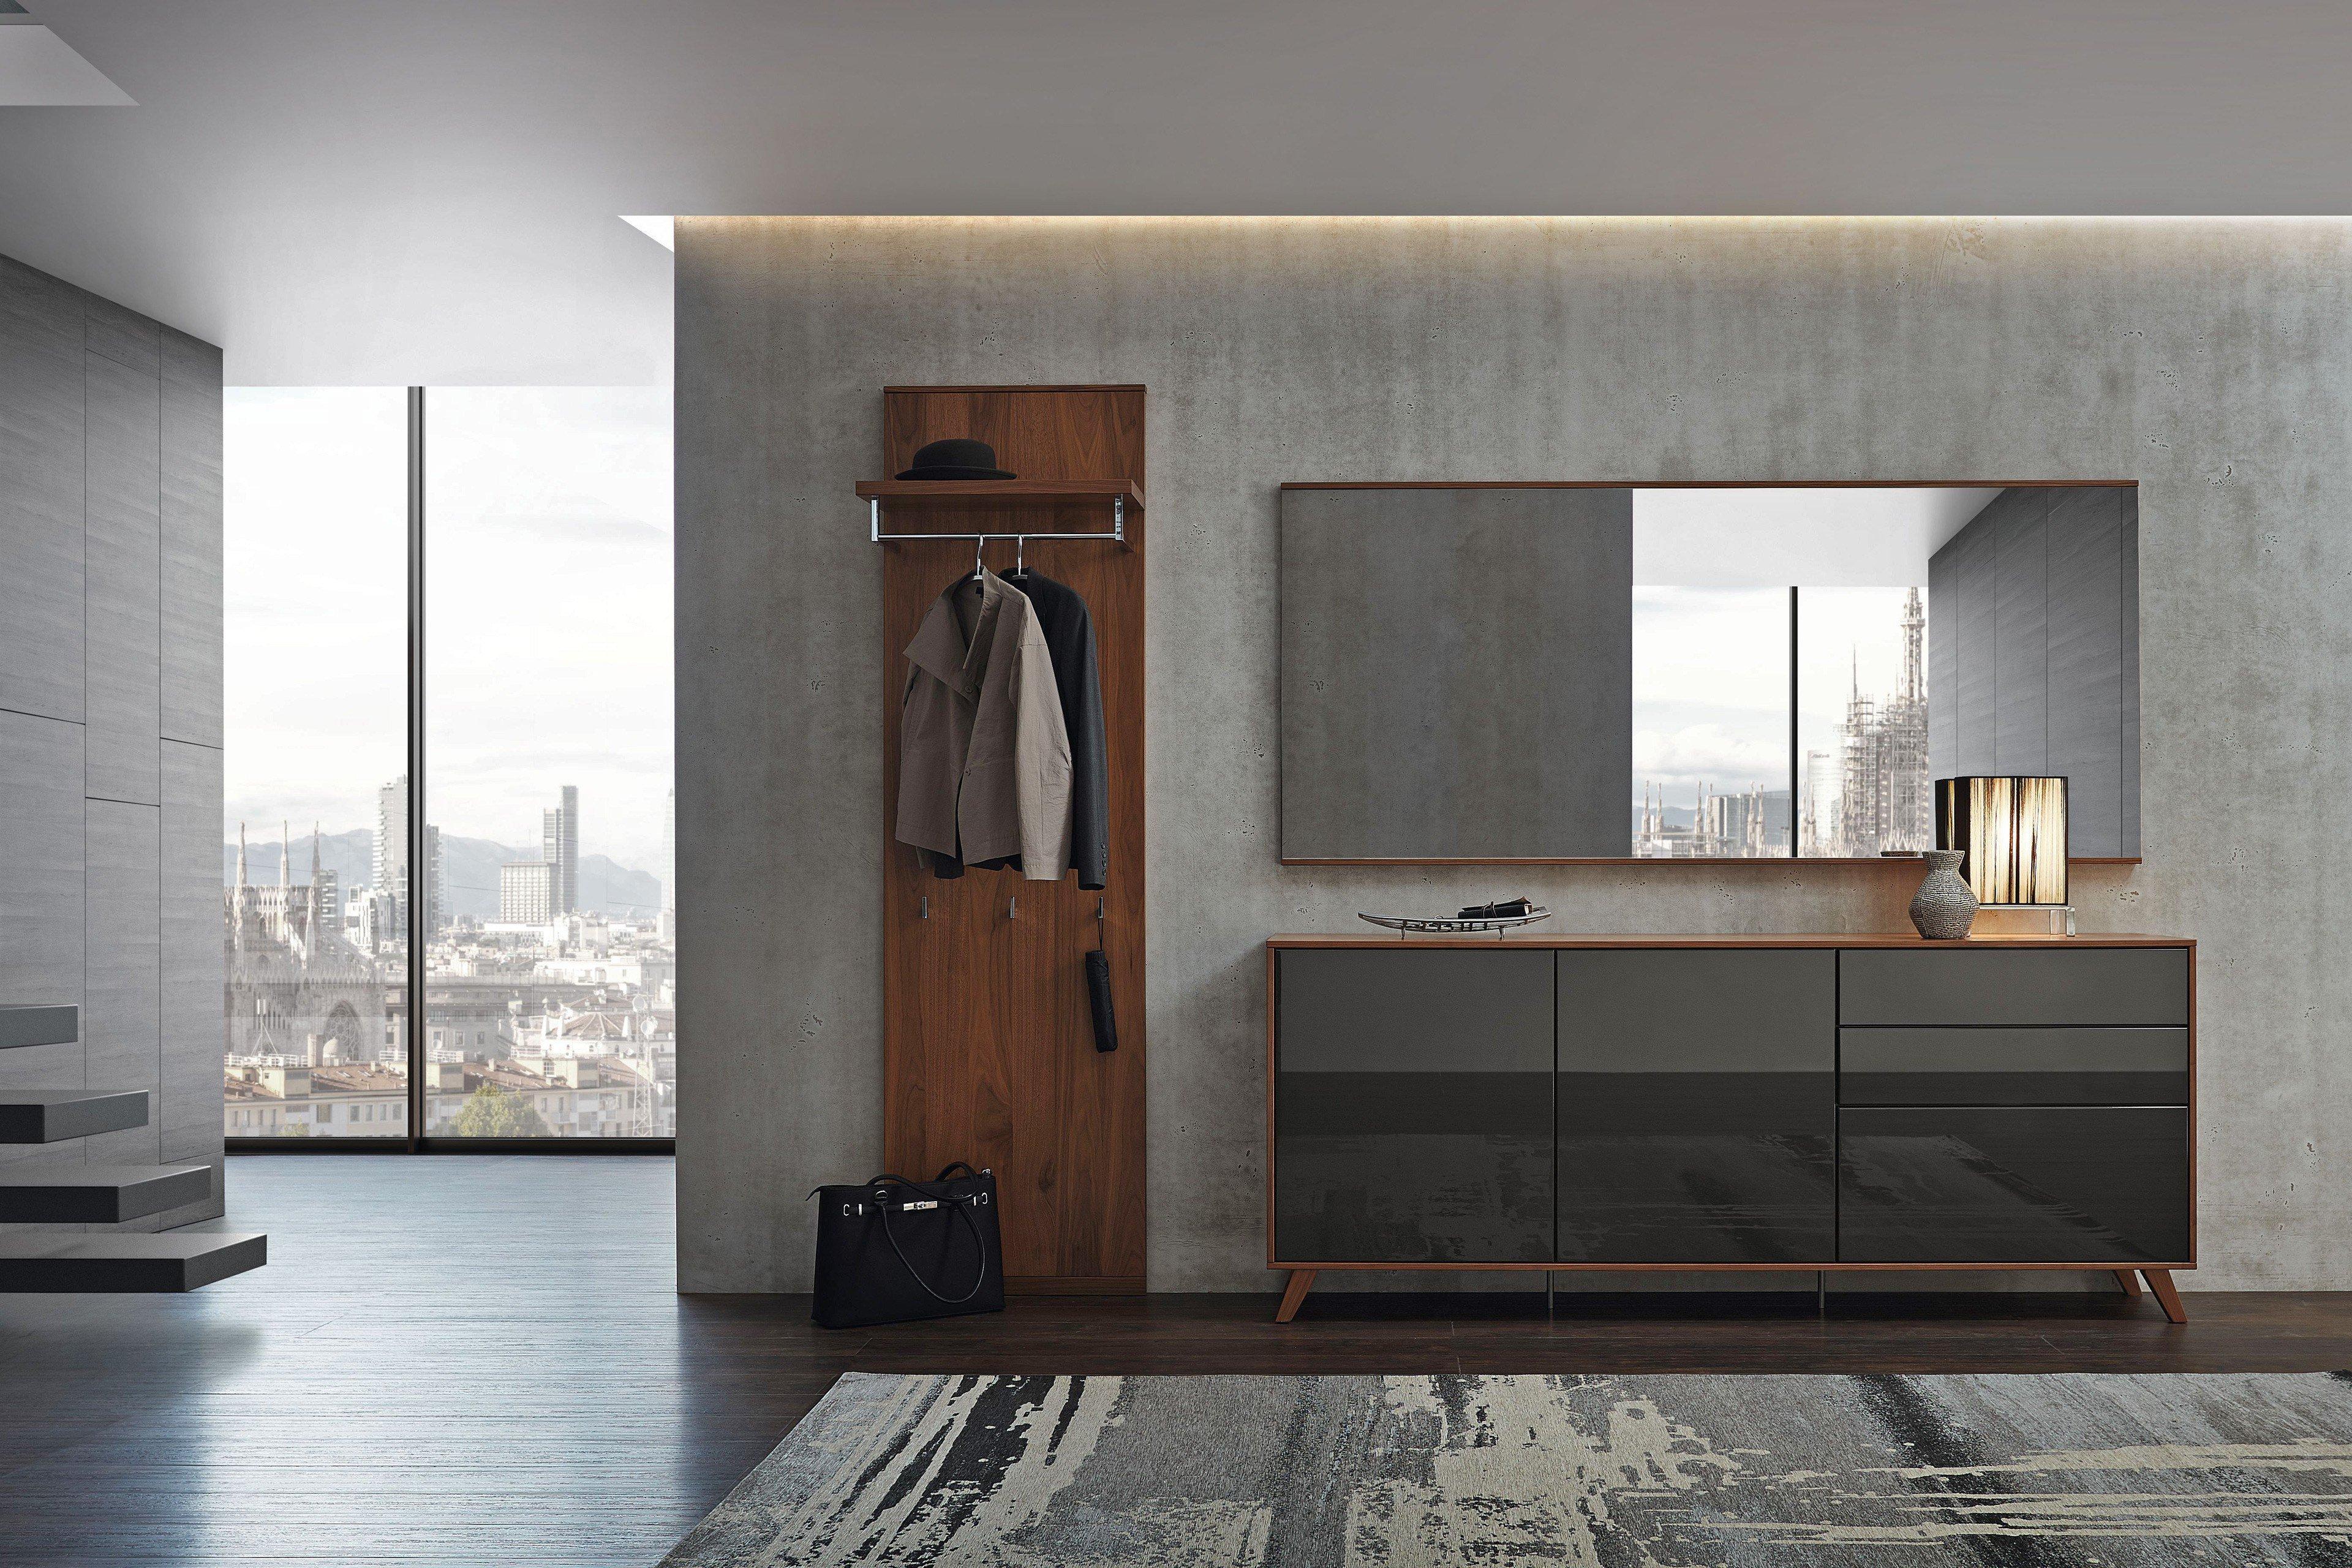 rietberger garderobe nussbaum nova lack graphit m bel. Black Bedroom Furniture Sets. Home Design Ideas